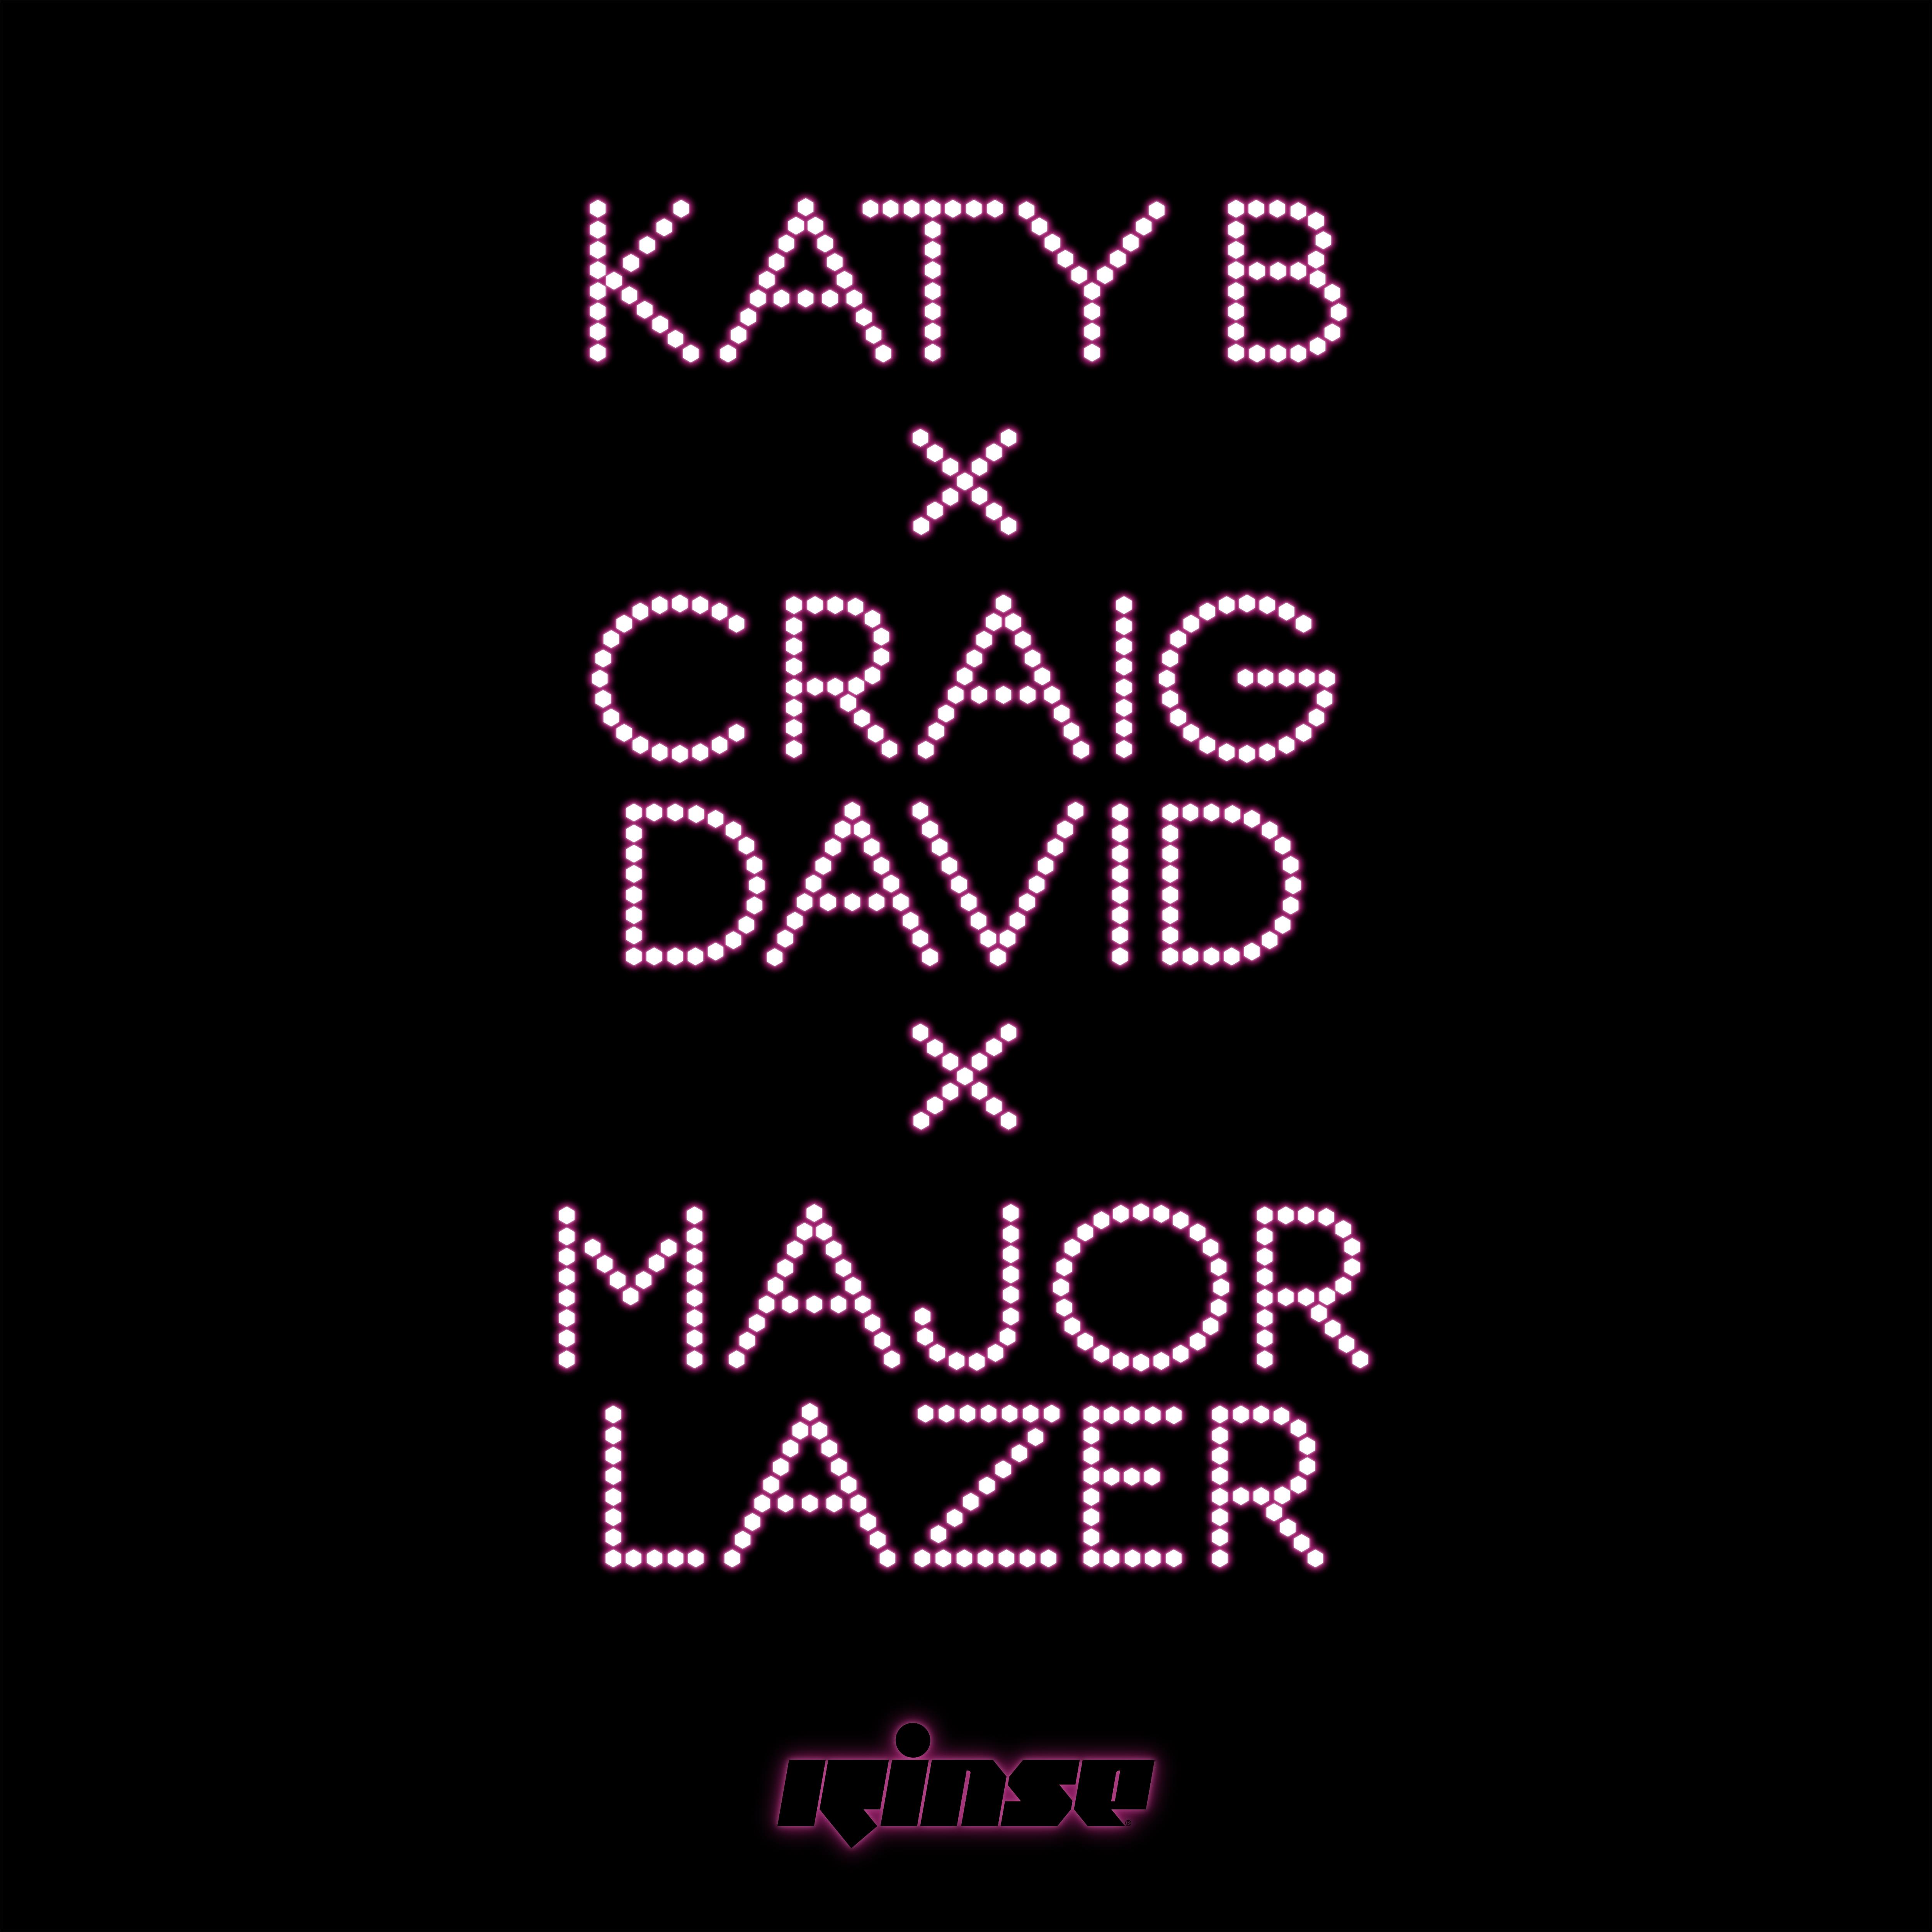 Katy_B_x_Craig_David_x_Major_Lazer_-_Who_Am_I.jpg